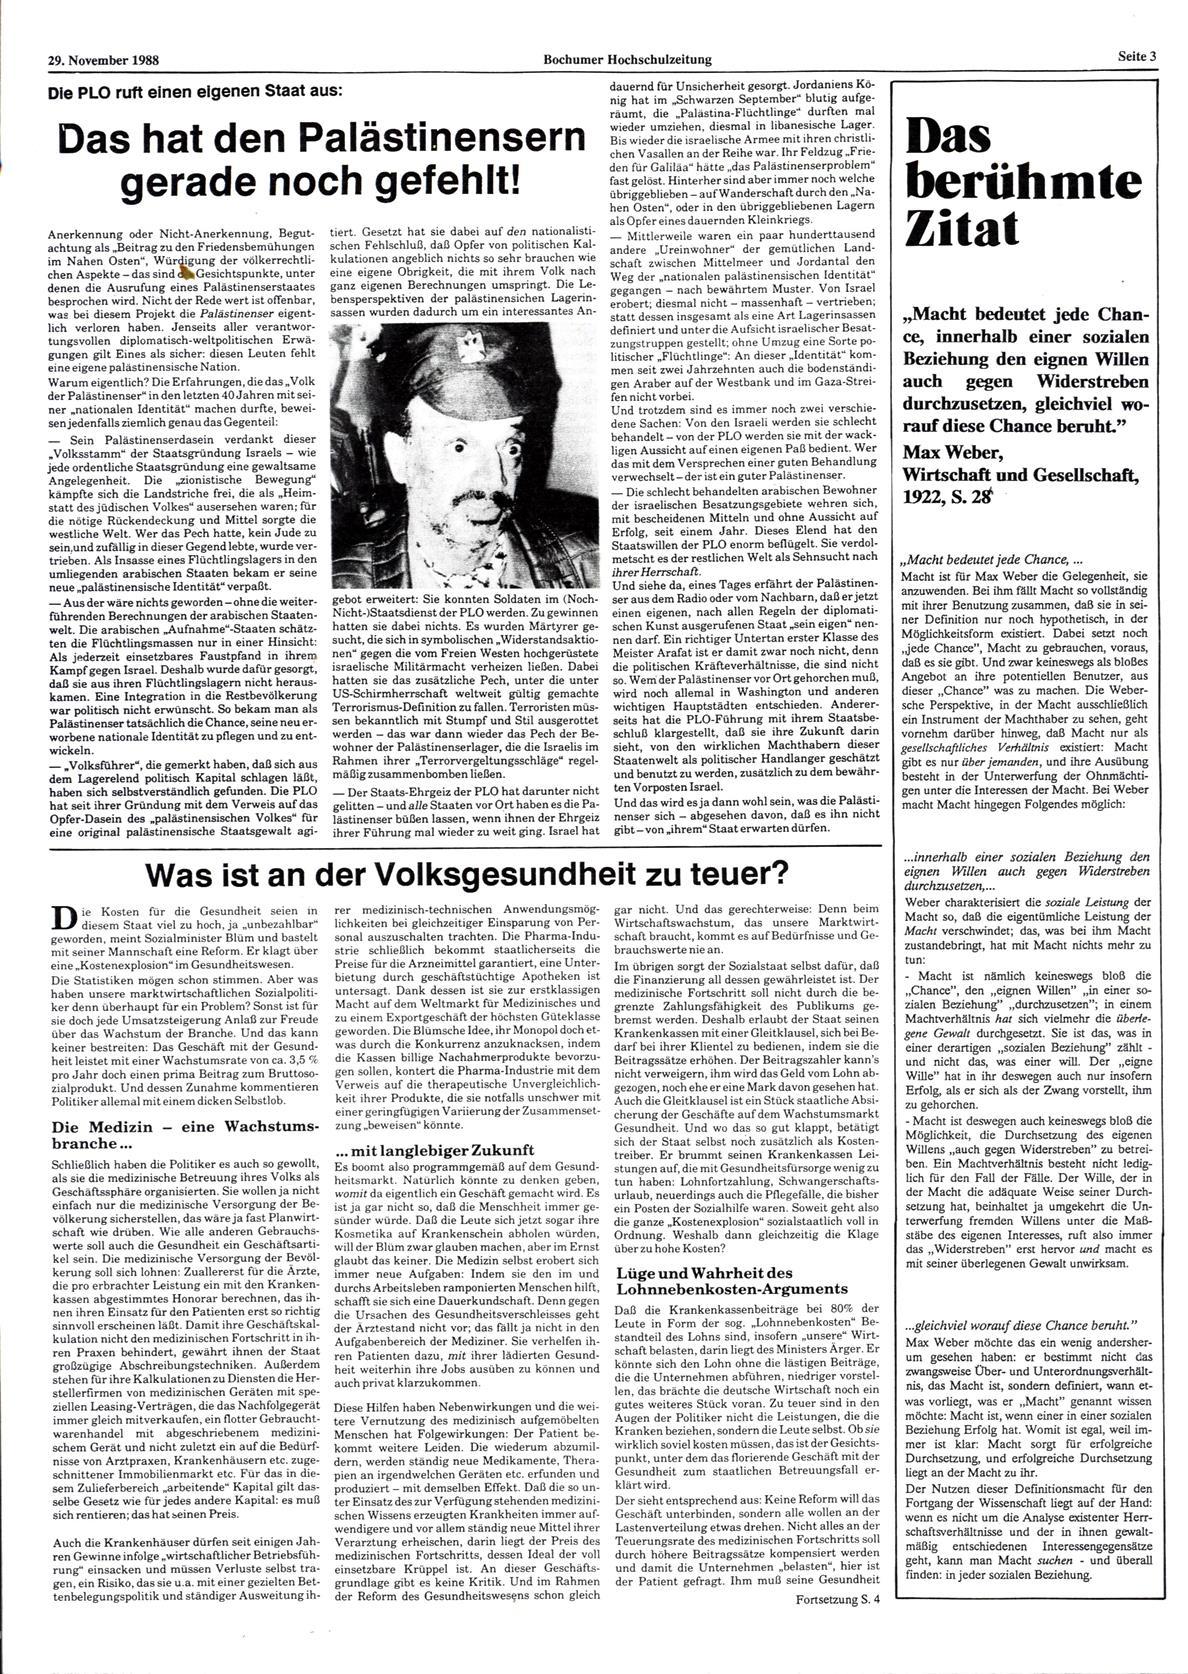 Bochum_BHZ_19881129_182_003